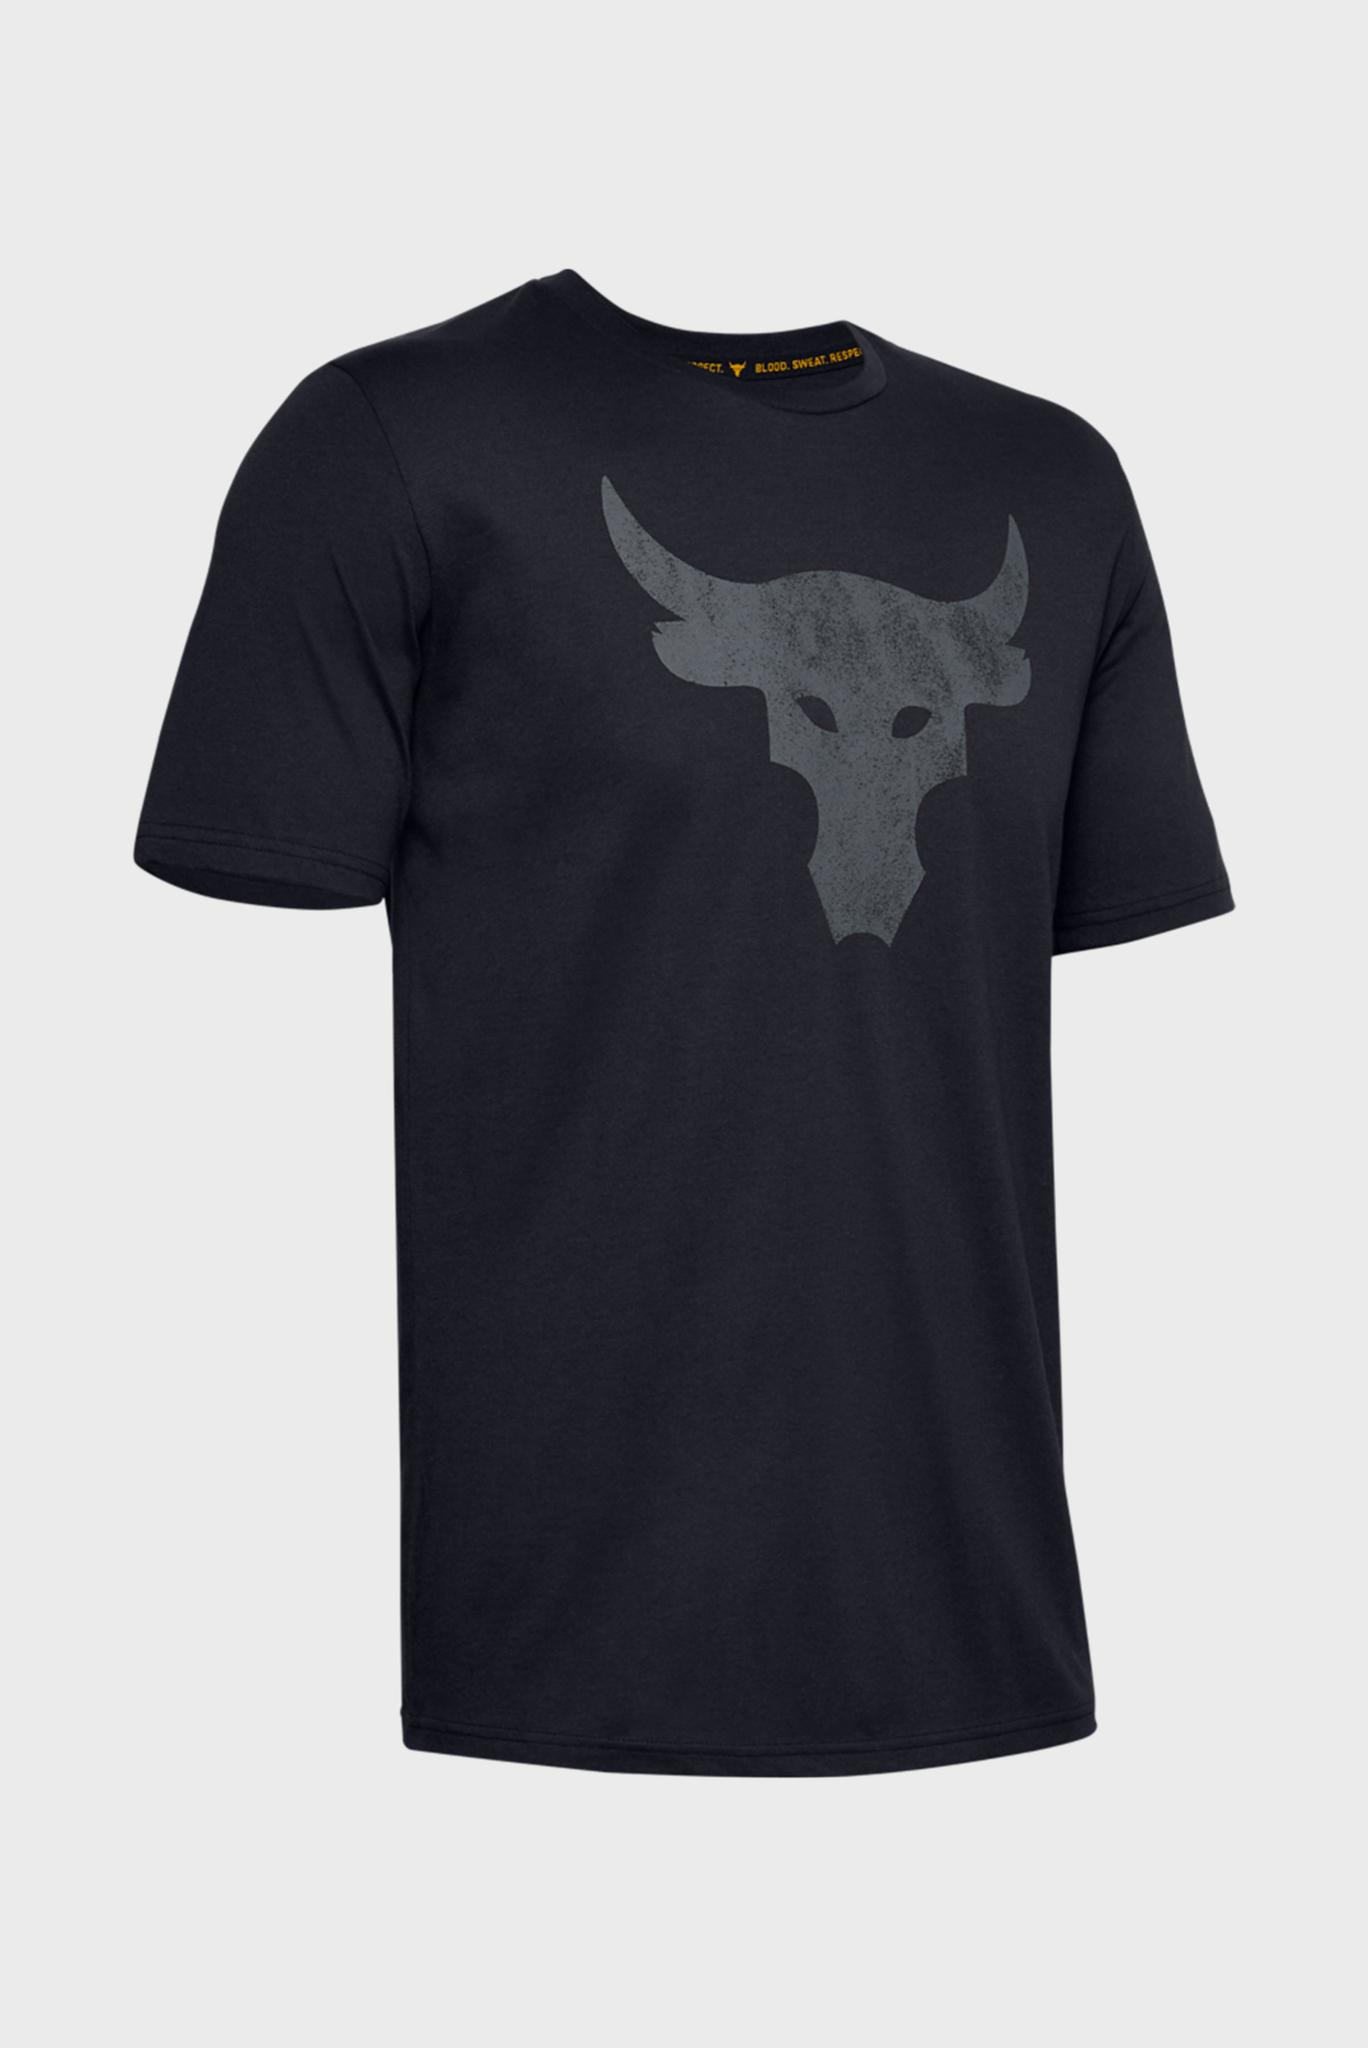 Мужская черная спортивная футболка Project Rock Brahma Bull SS Under Armour